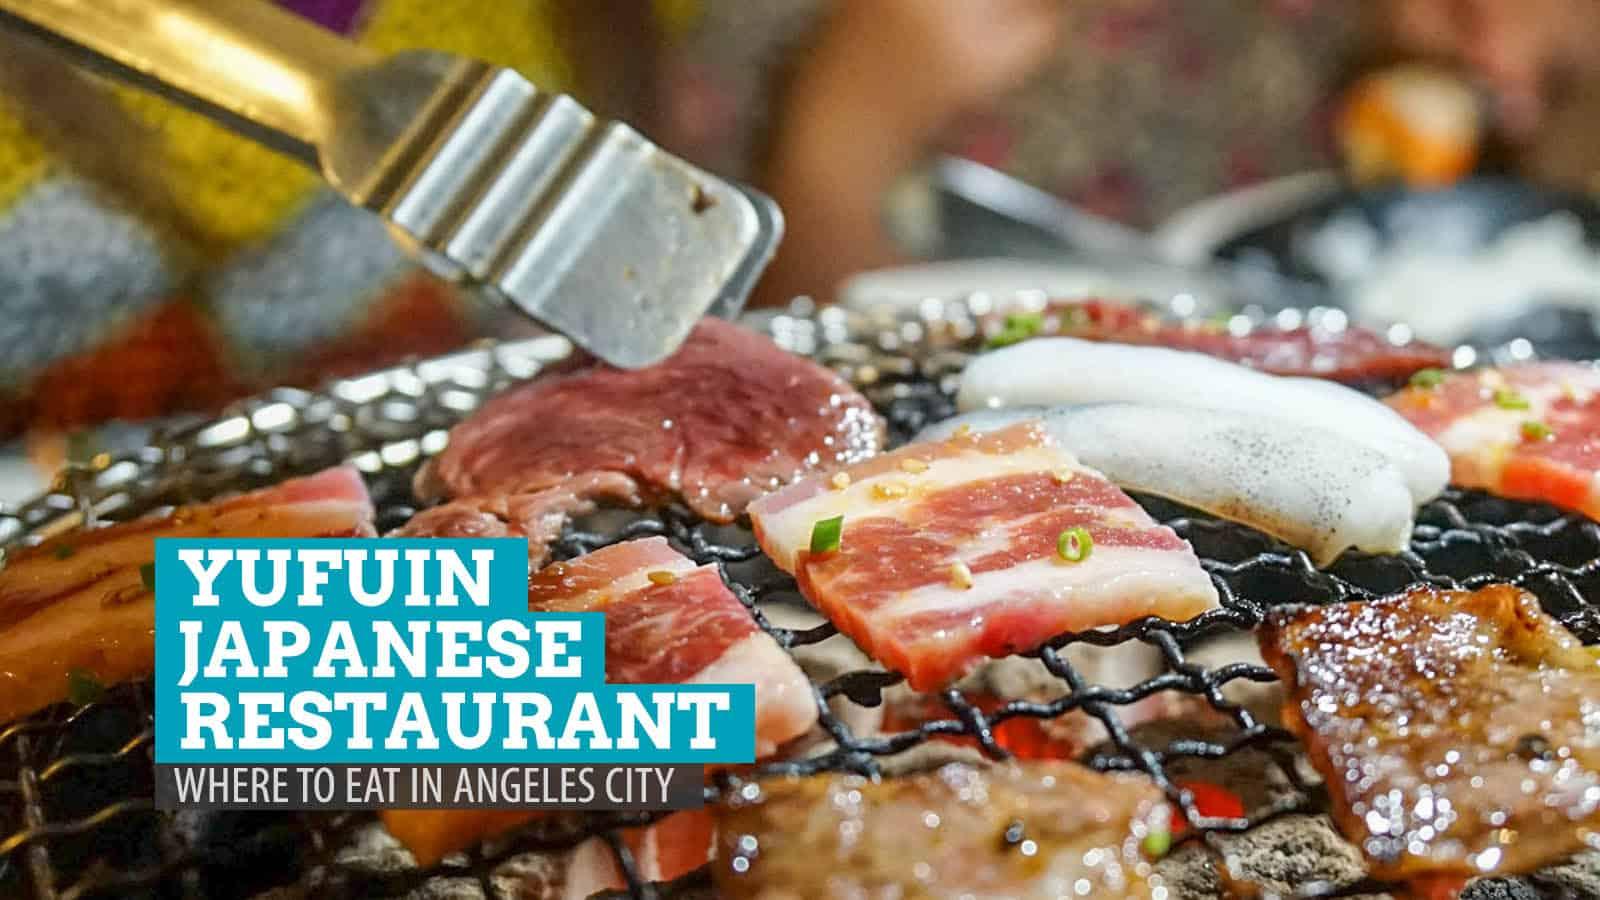 Yufuin日本餐厅。在邦板牙省安吉利斯市的饮食地点   穷游者行程博客